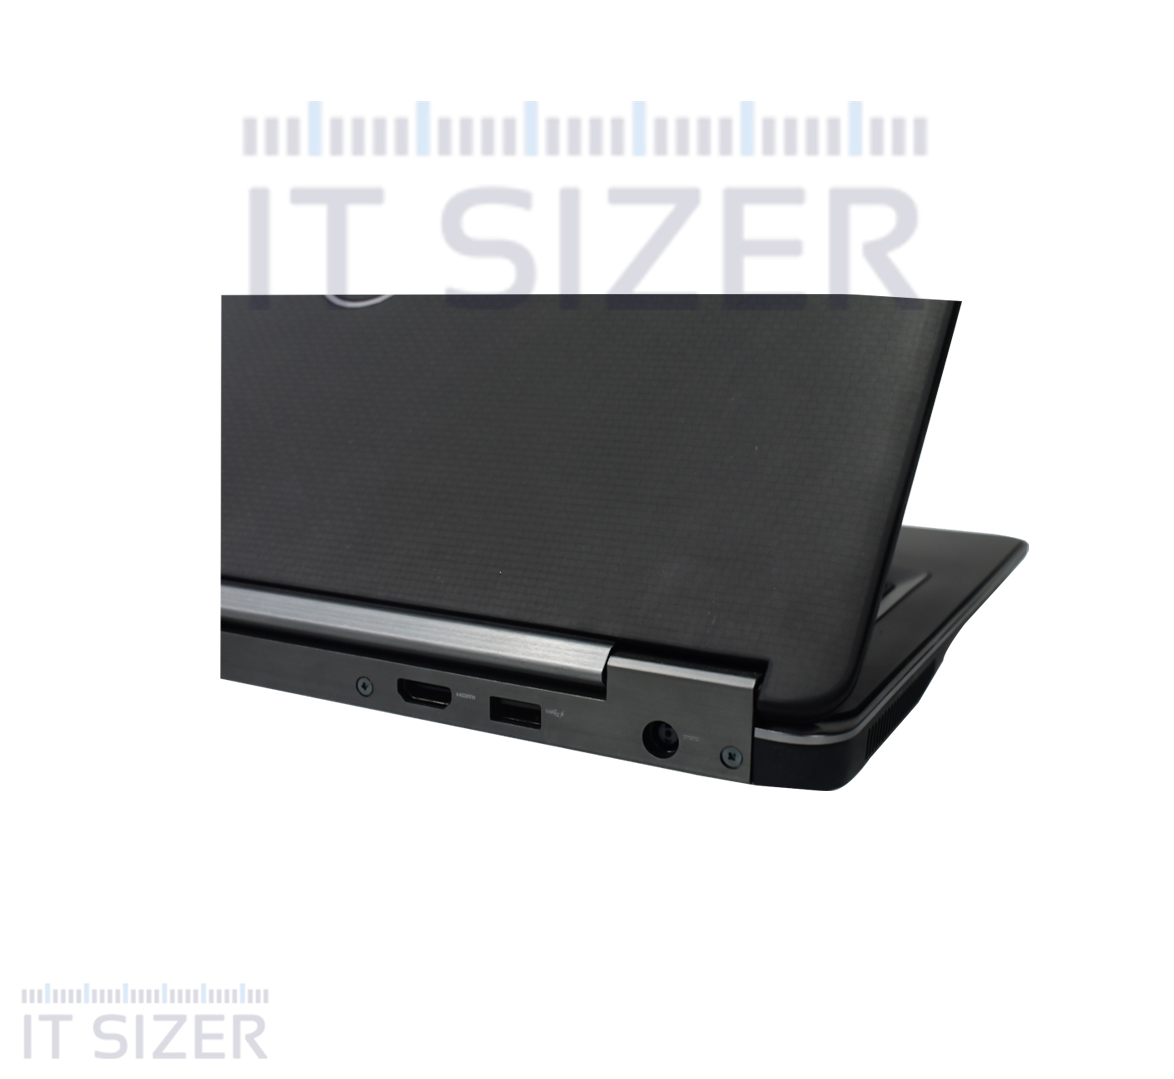 Dell E7440 Business Laptop, Intel Core i5-4310U CPU, 8GB DDR3L SODIMM RAM, 256GB SSD 2.5, 14 inch Touch Display, Windows 10 pro (Renewed)